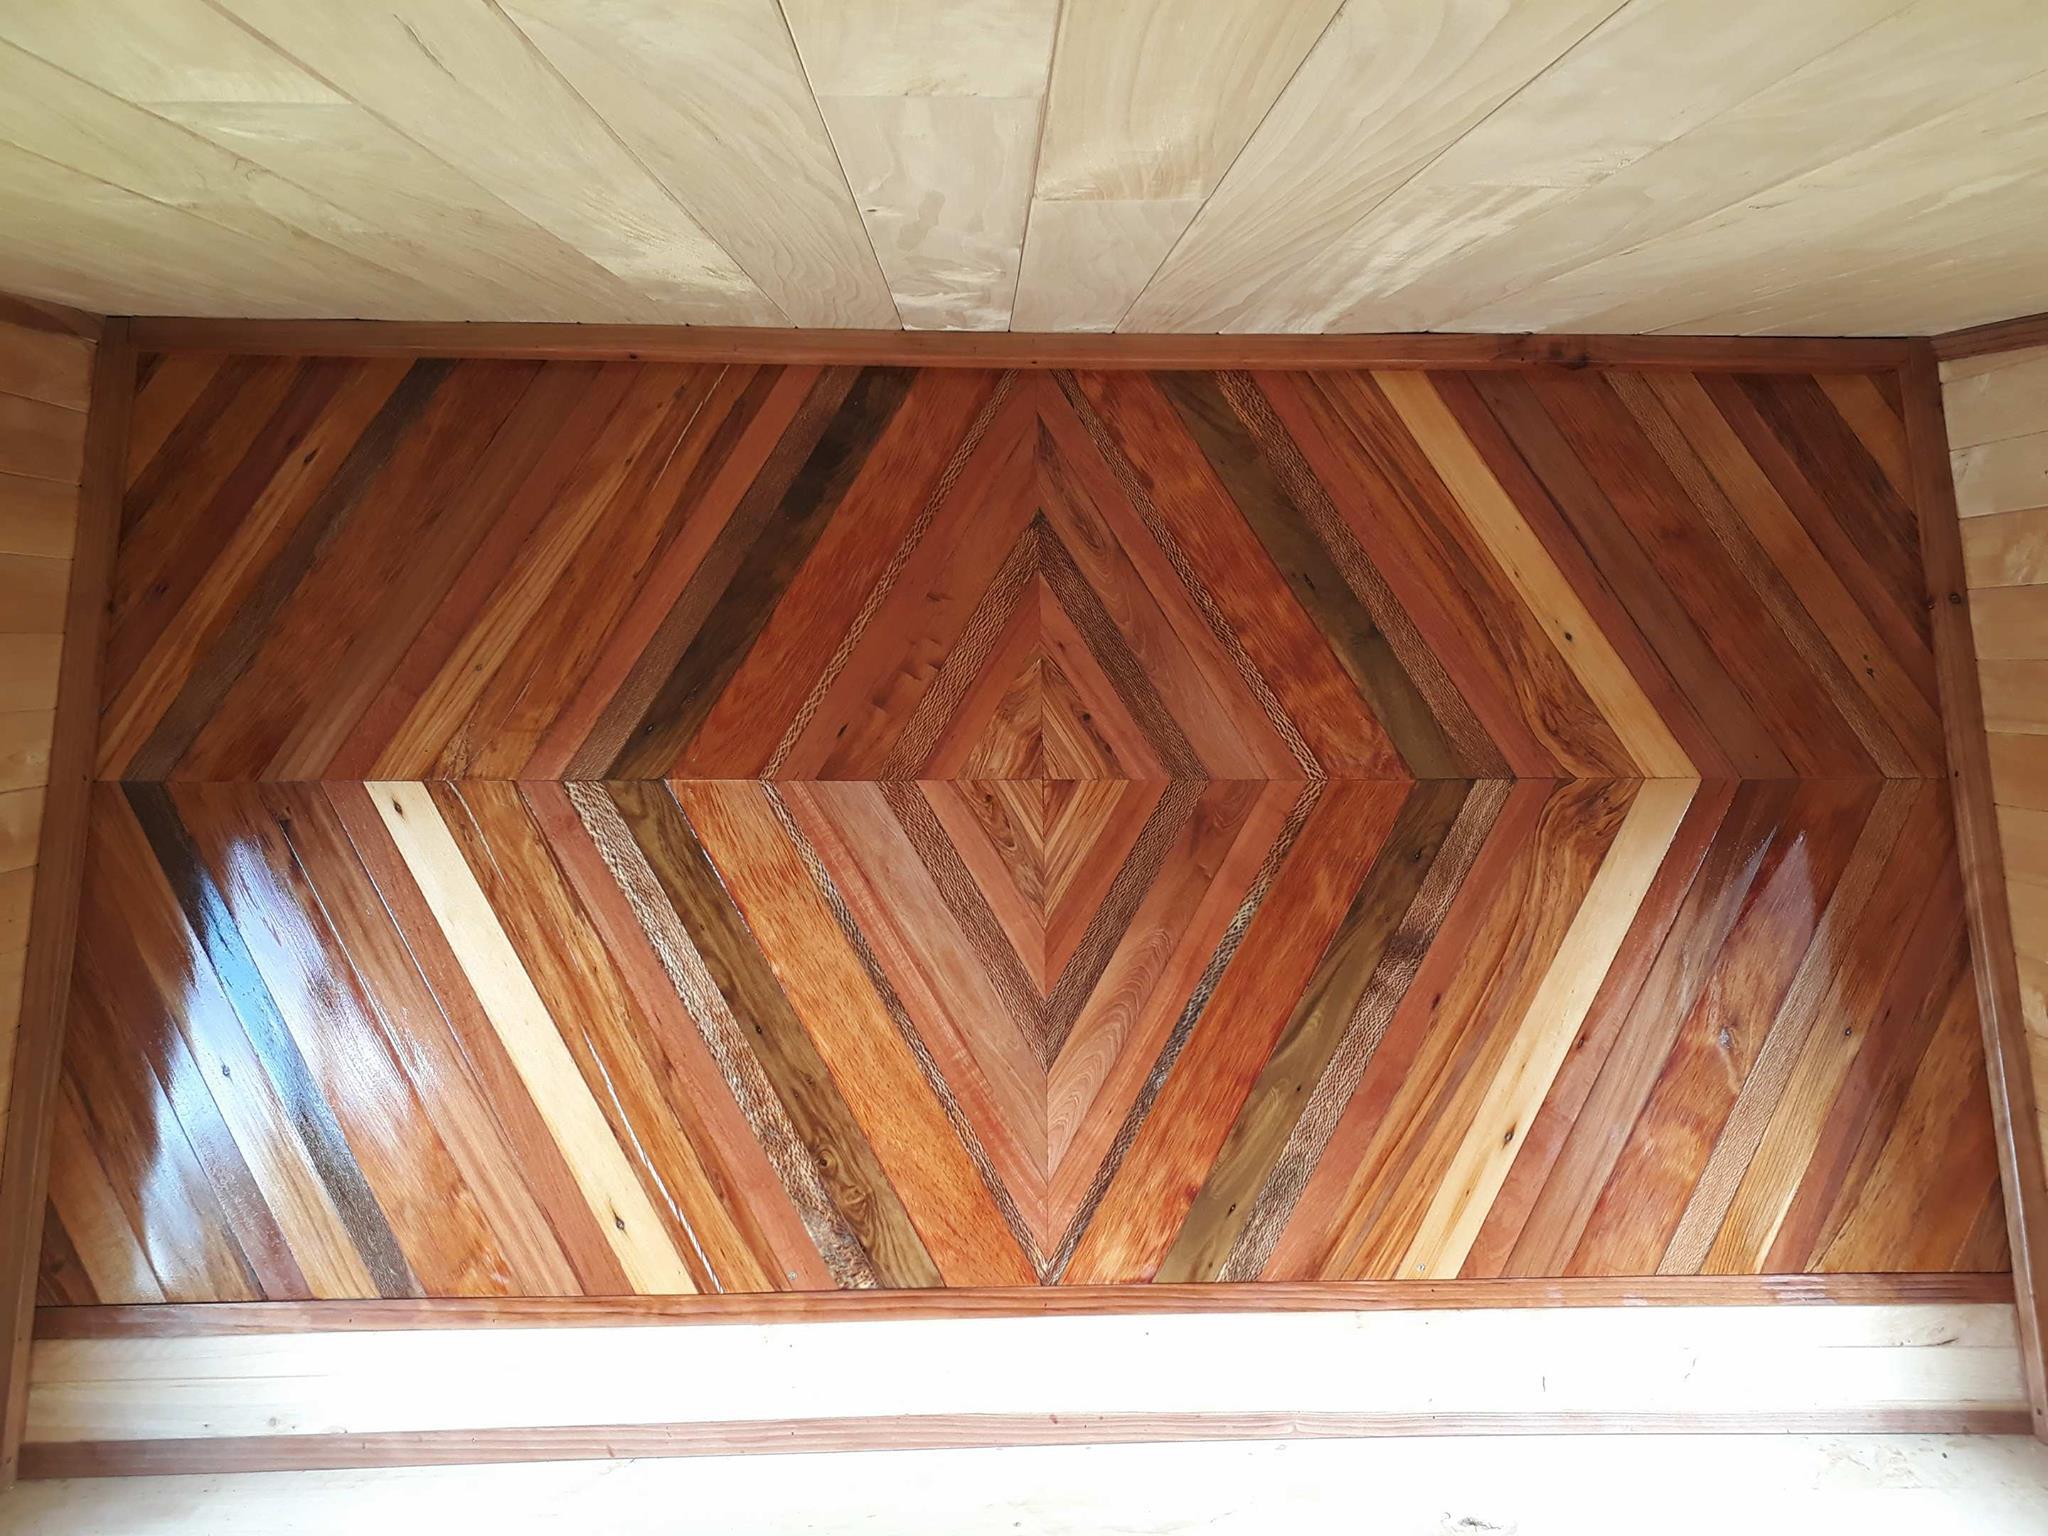 Jawa - Bedroom feature wall